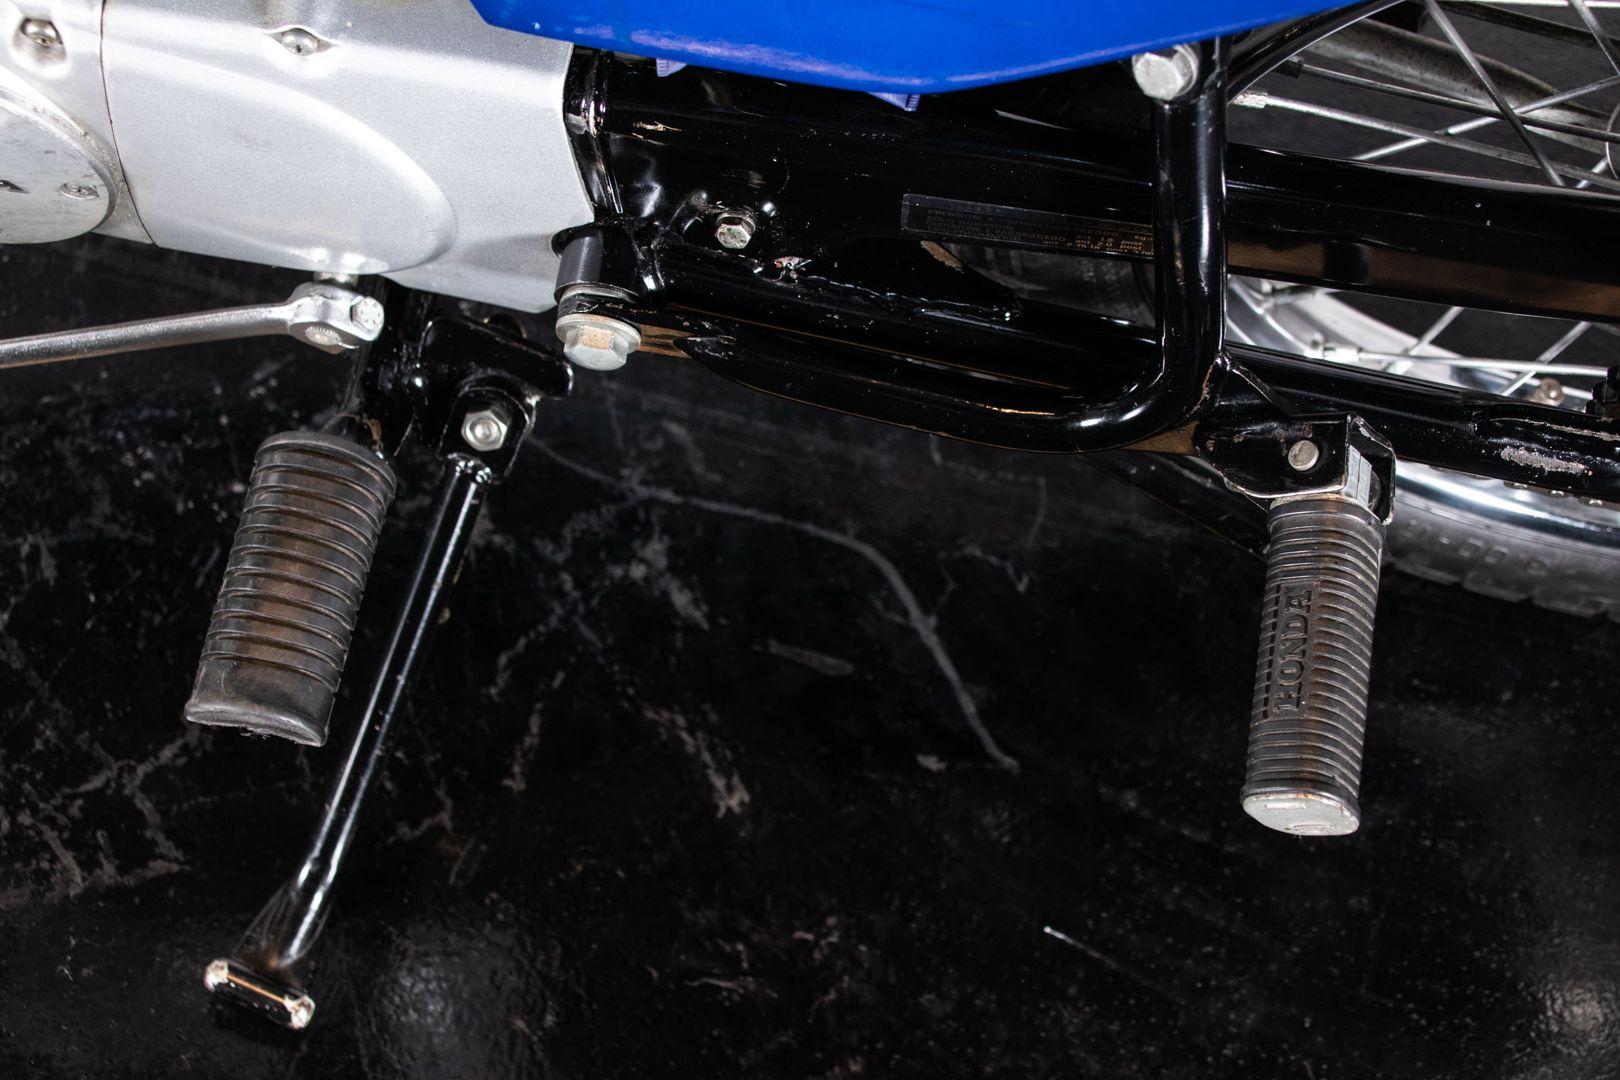 1980 Honda CB 125 7/C 63471